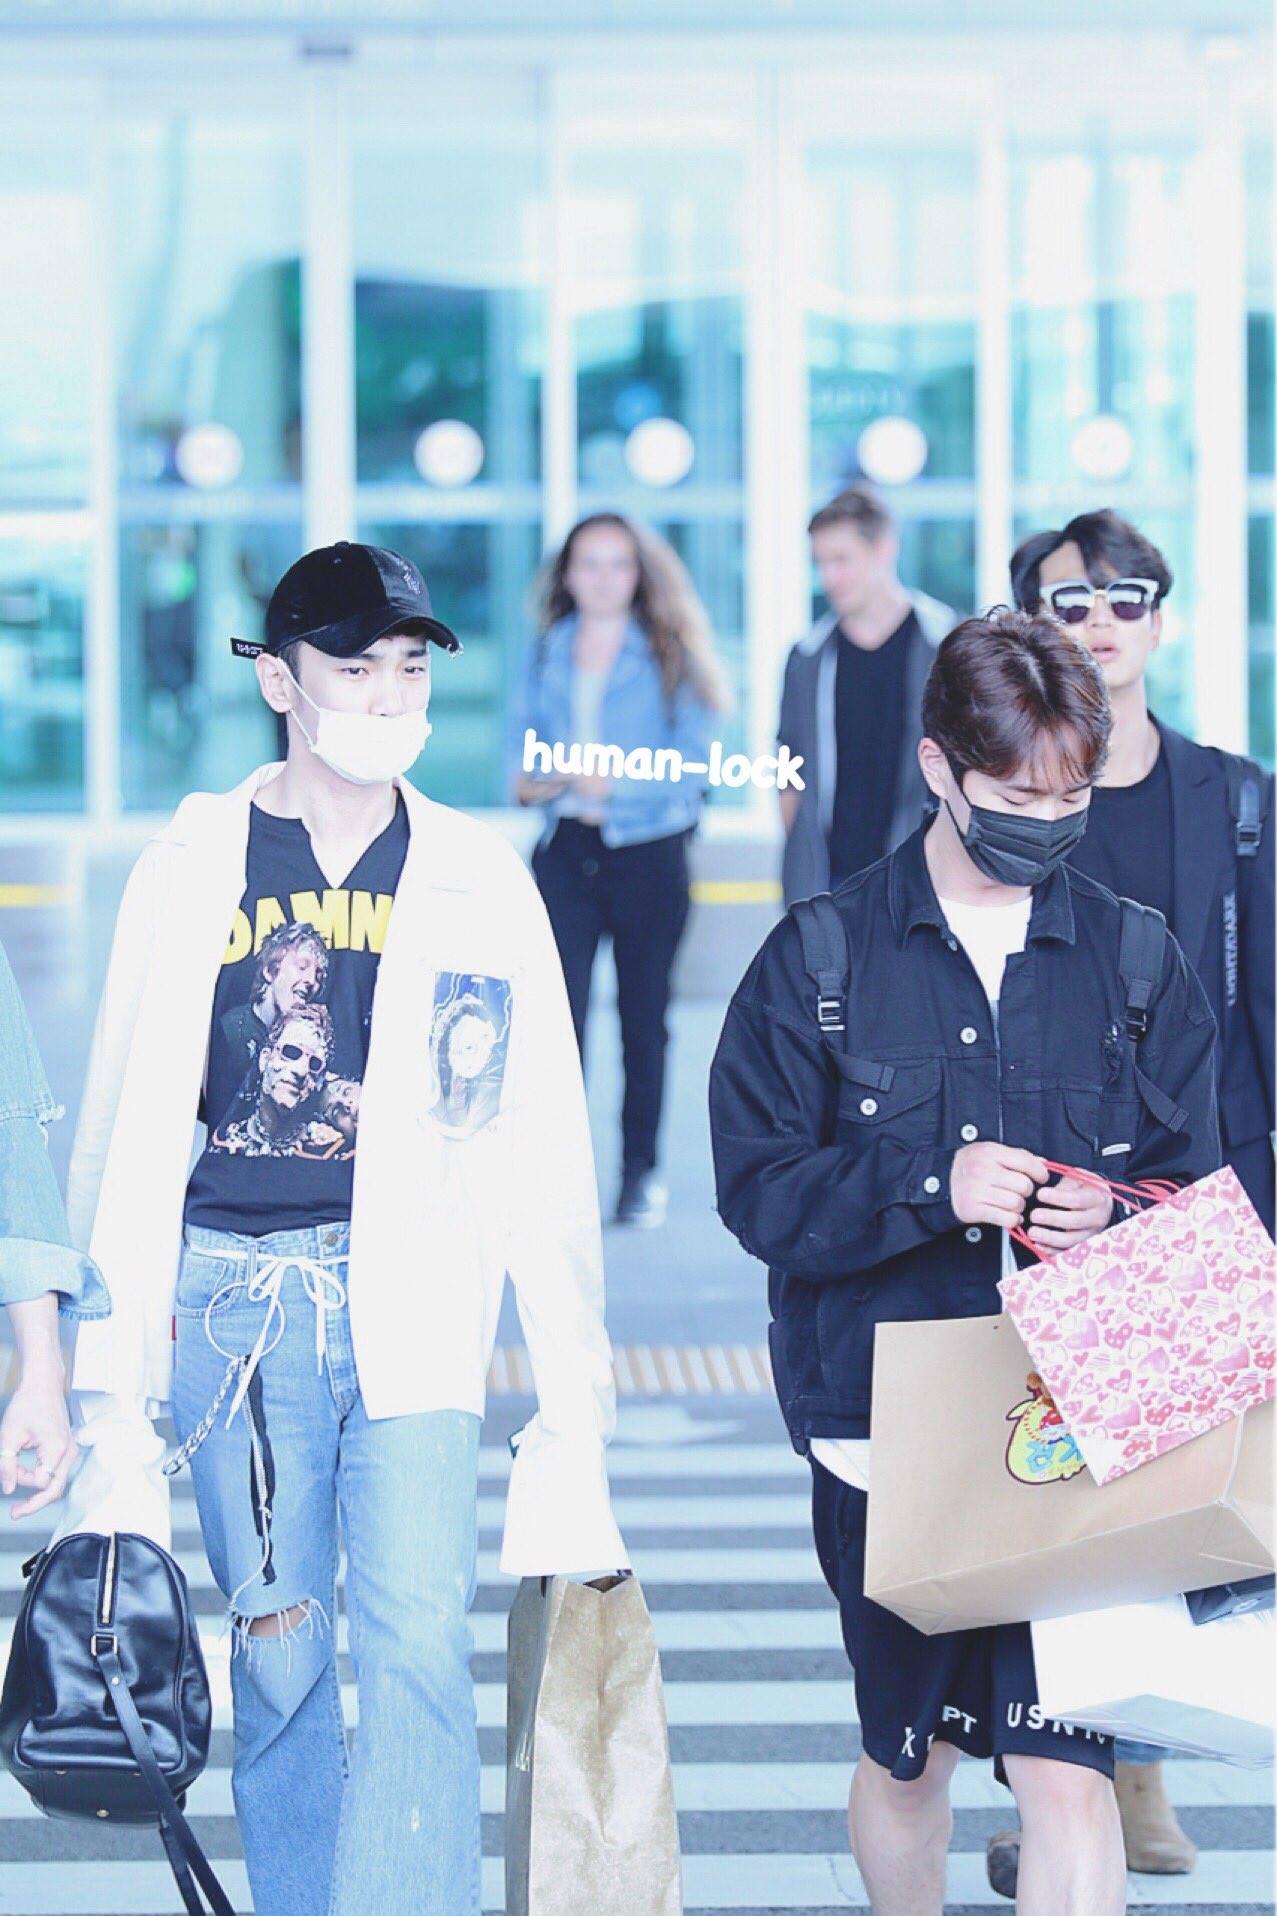 [IMG/160718] Onew, Jonghyun, Key, Minho @Aeropuerto de Kansai e Incheon (Jap-Cor) V2JTy91k